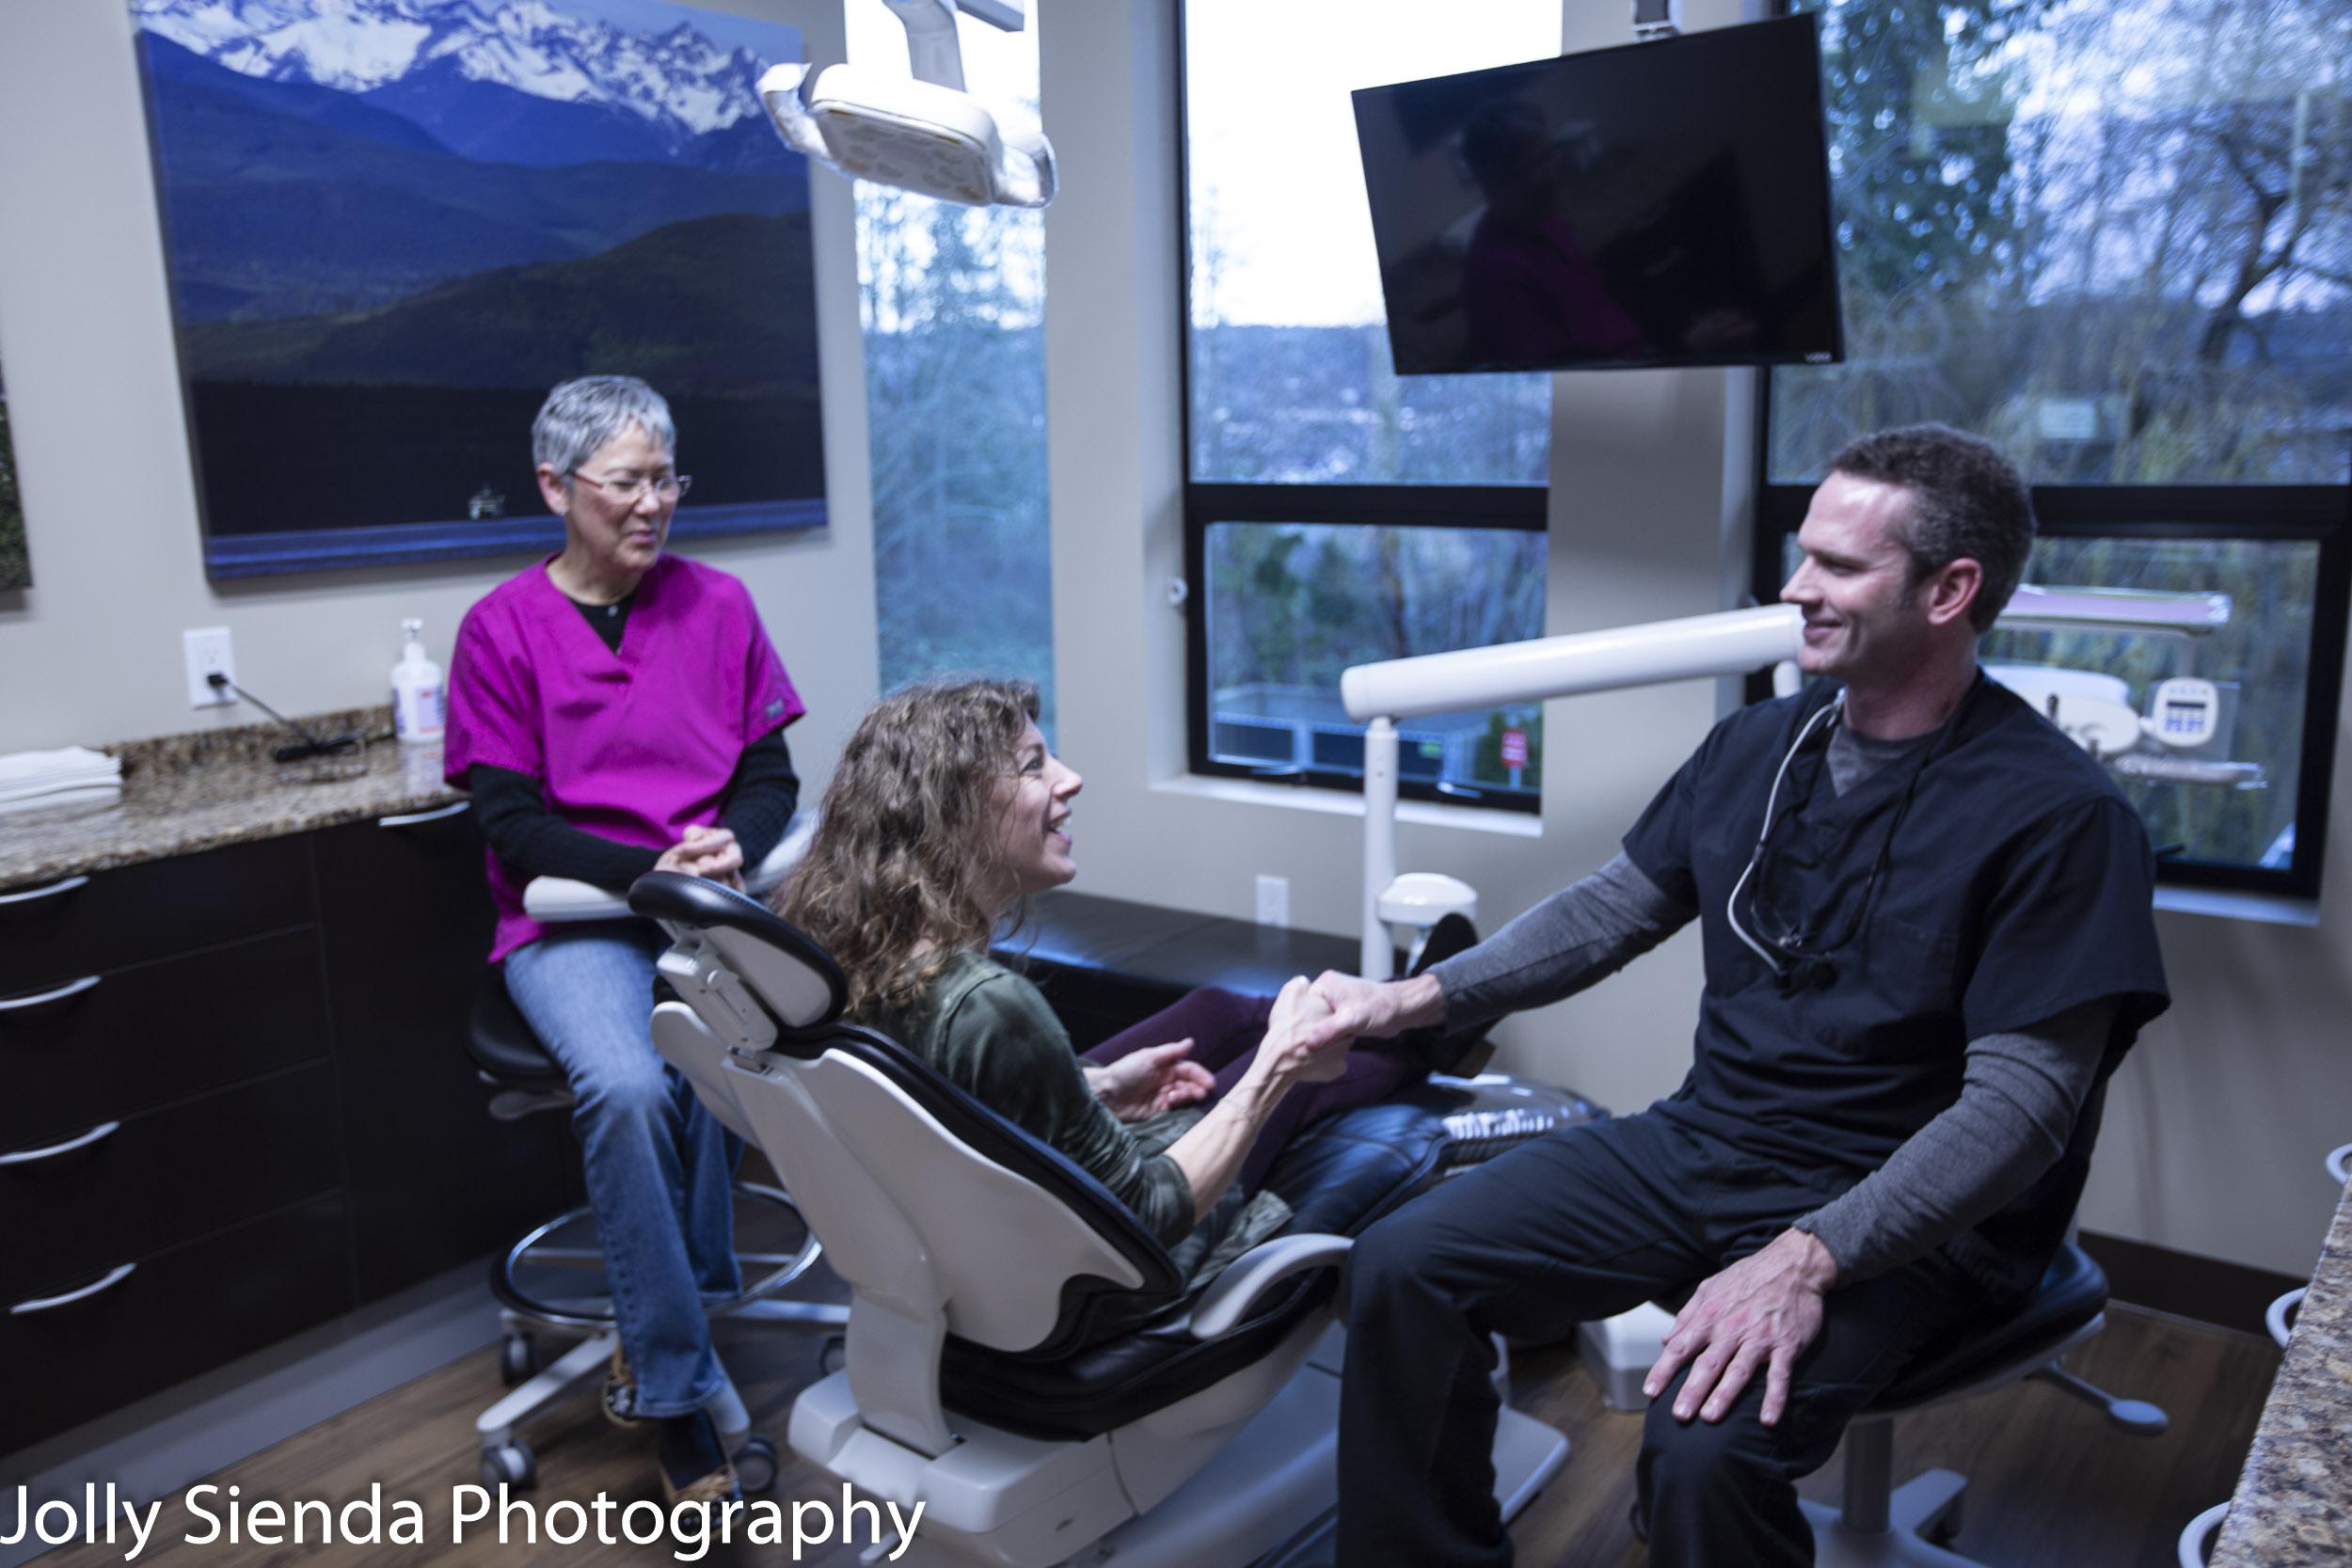 Dr. Matthew Pollard greets a patient at Pollard Dental, Silverdale, Washington.